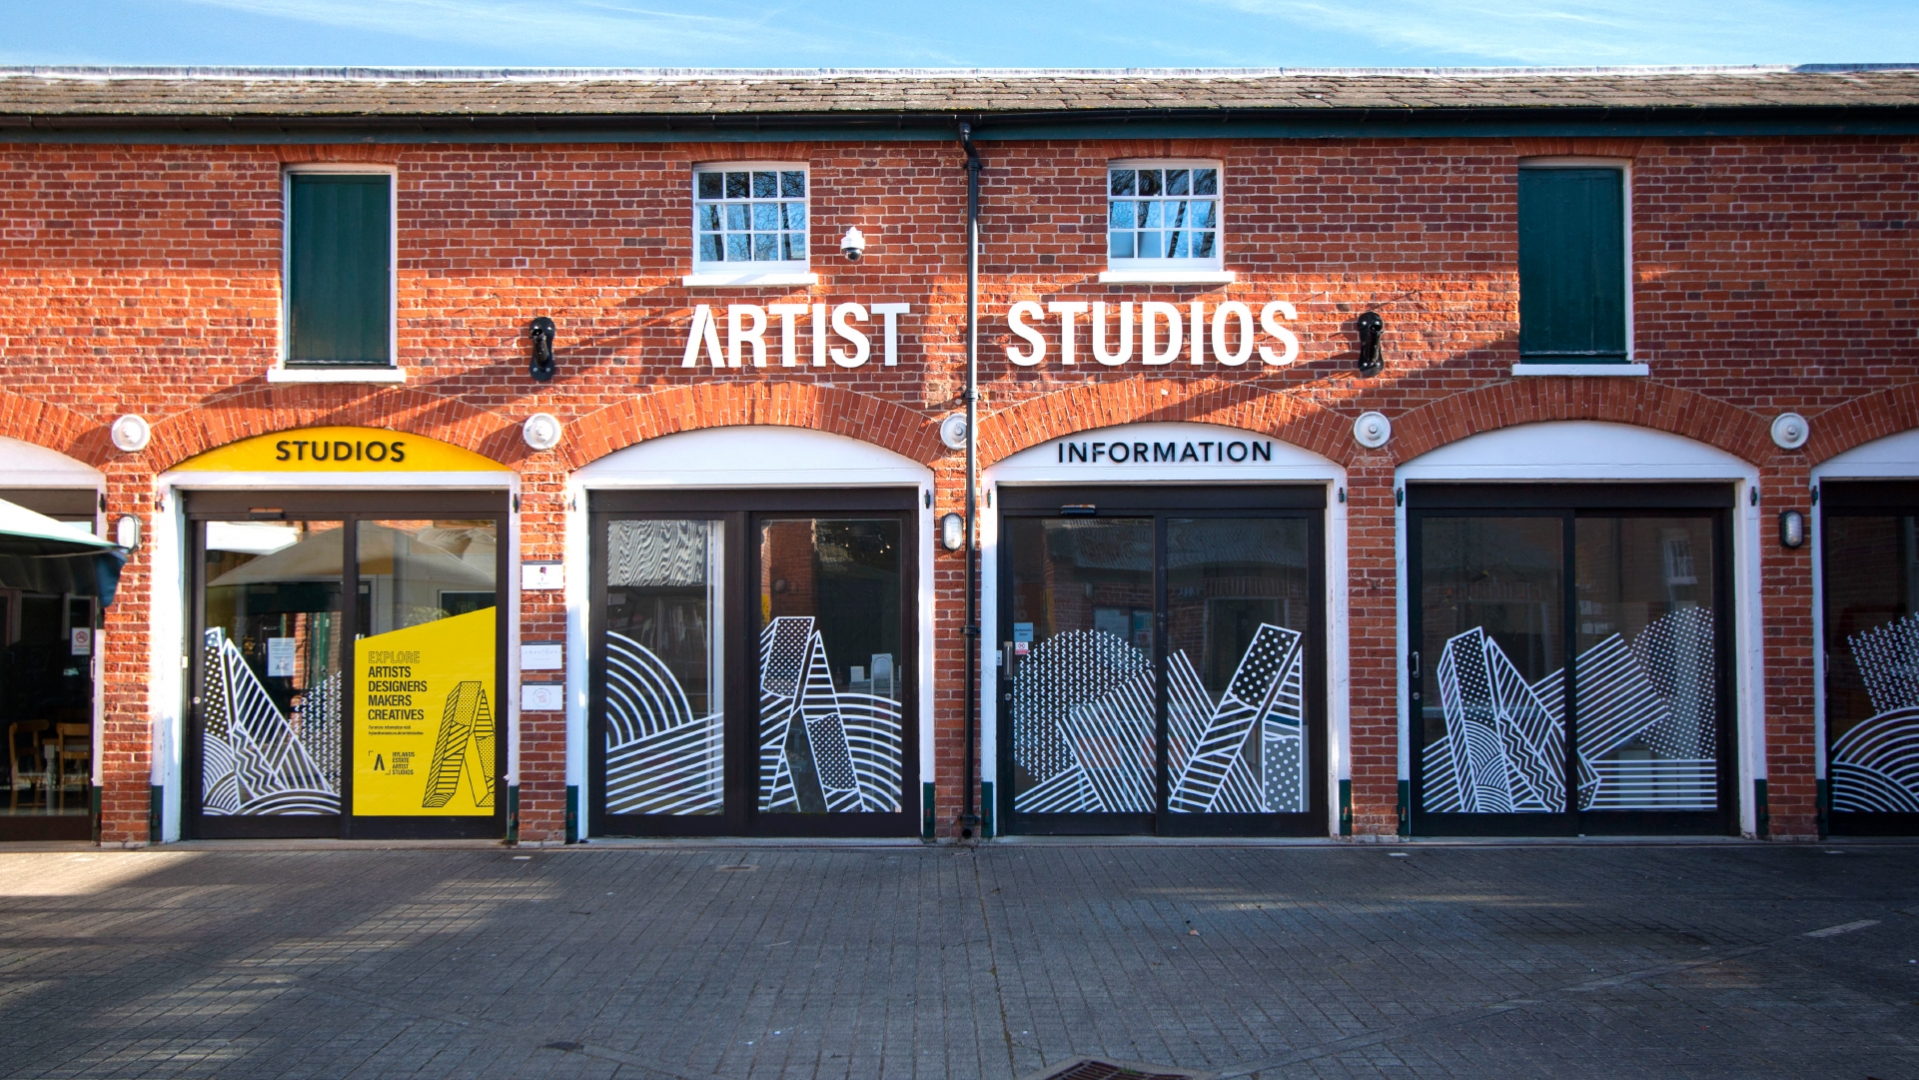 Environmental Graphics Artist Studios